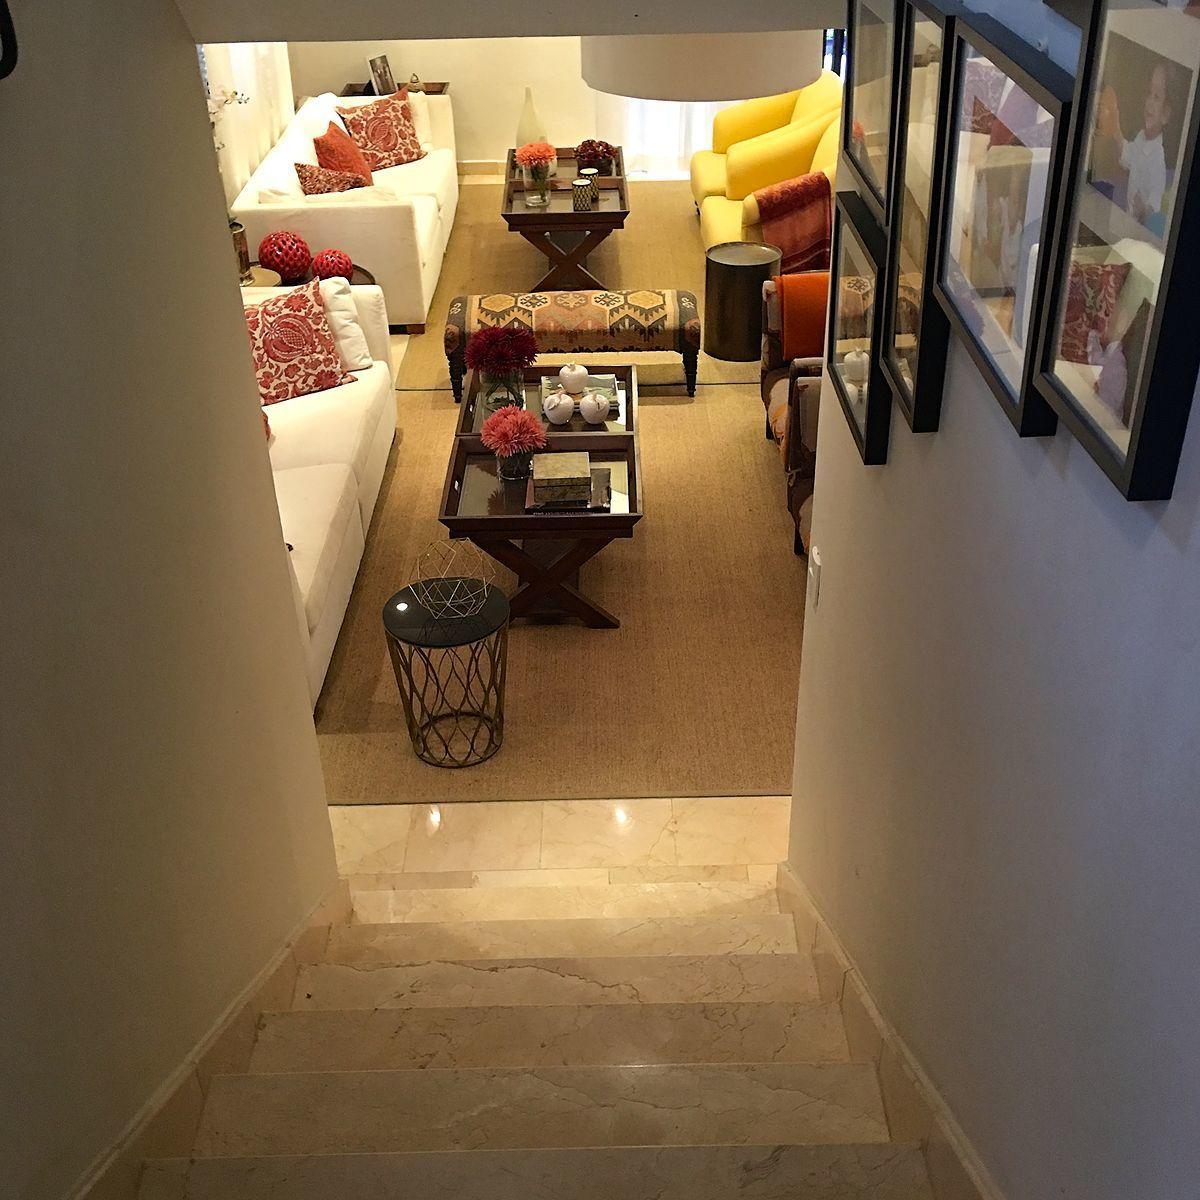 12 de 42: Escaleras al segundo piso